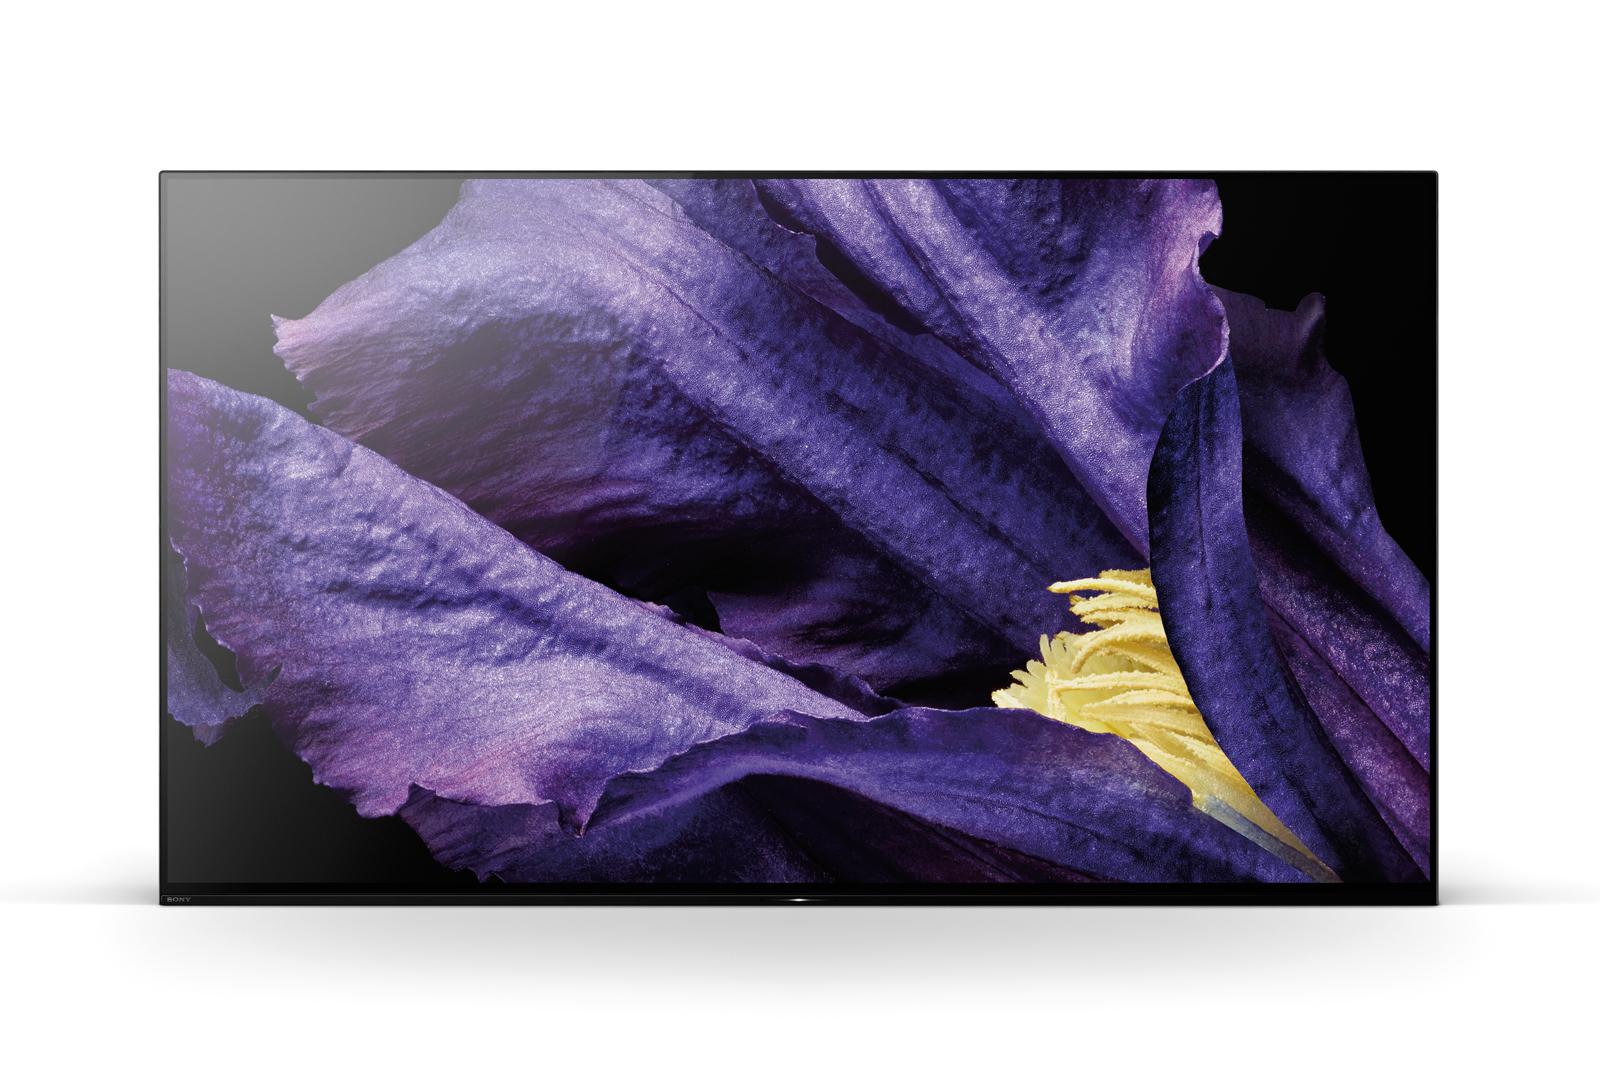 "Altezza Posizionamento Split product data sony kd-55af9 55"" 4k ultra hd smart tv wi-fi"